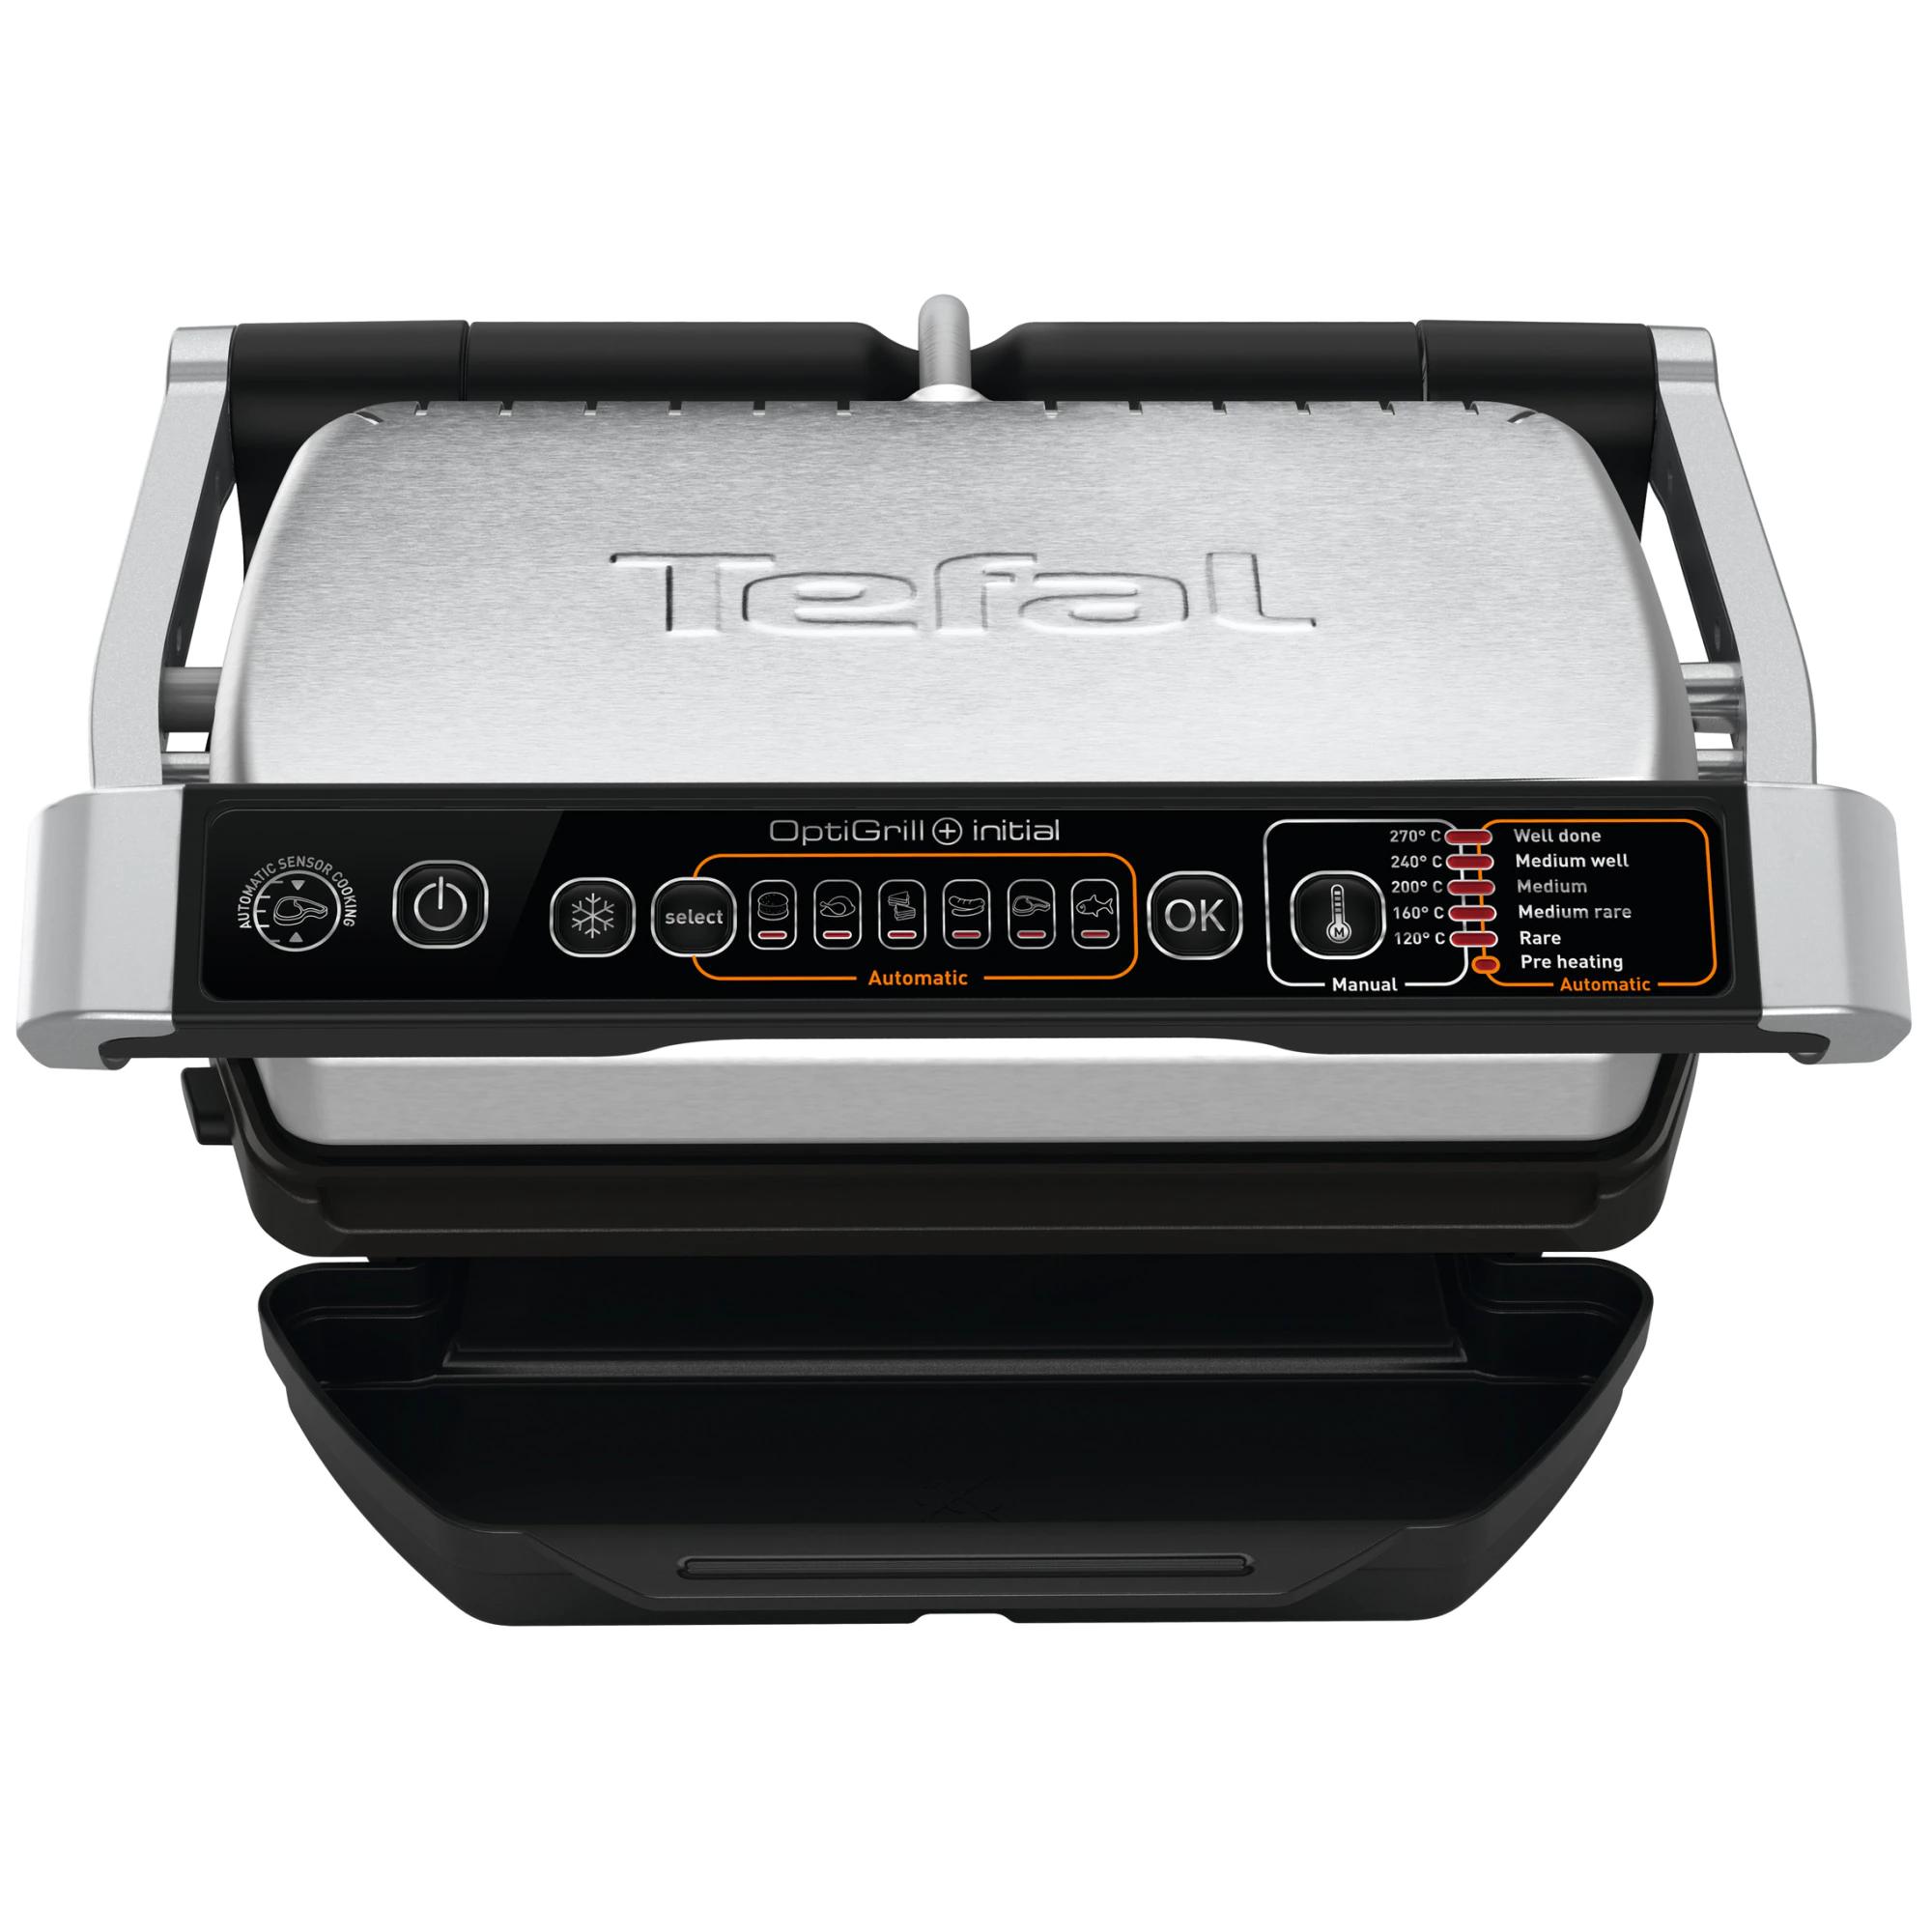 Tefal GC706D34 asztali grill